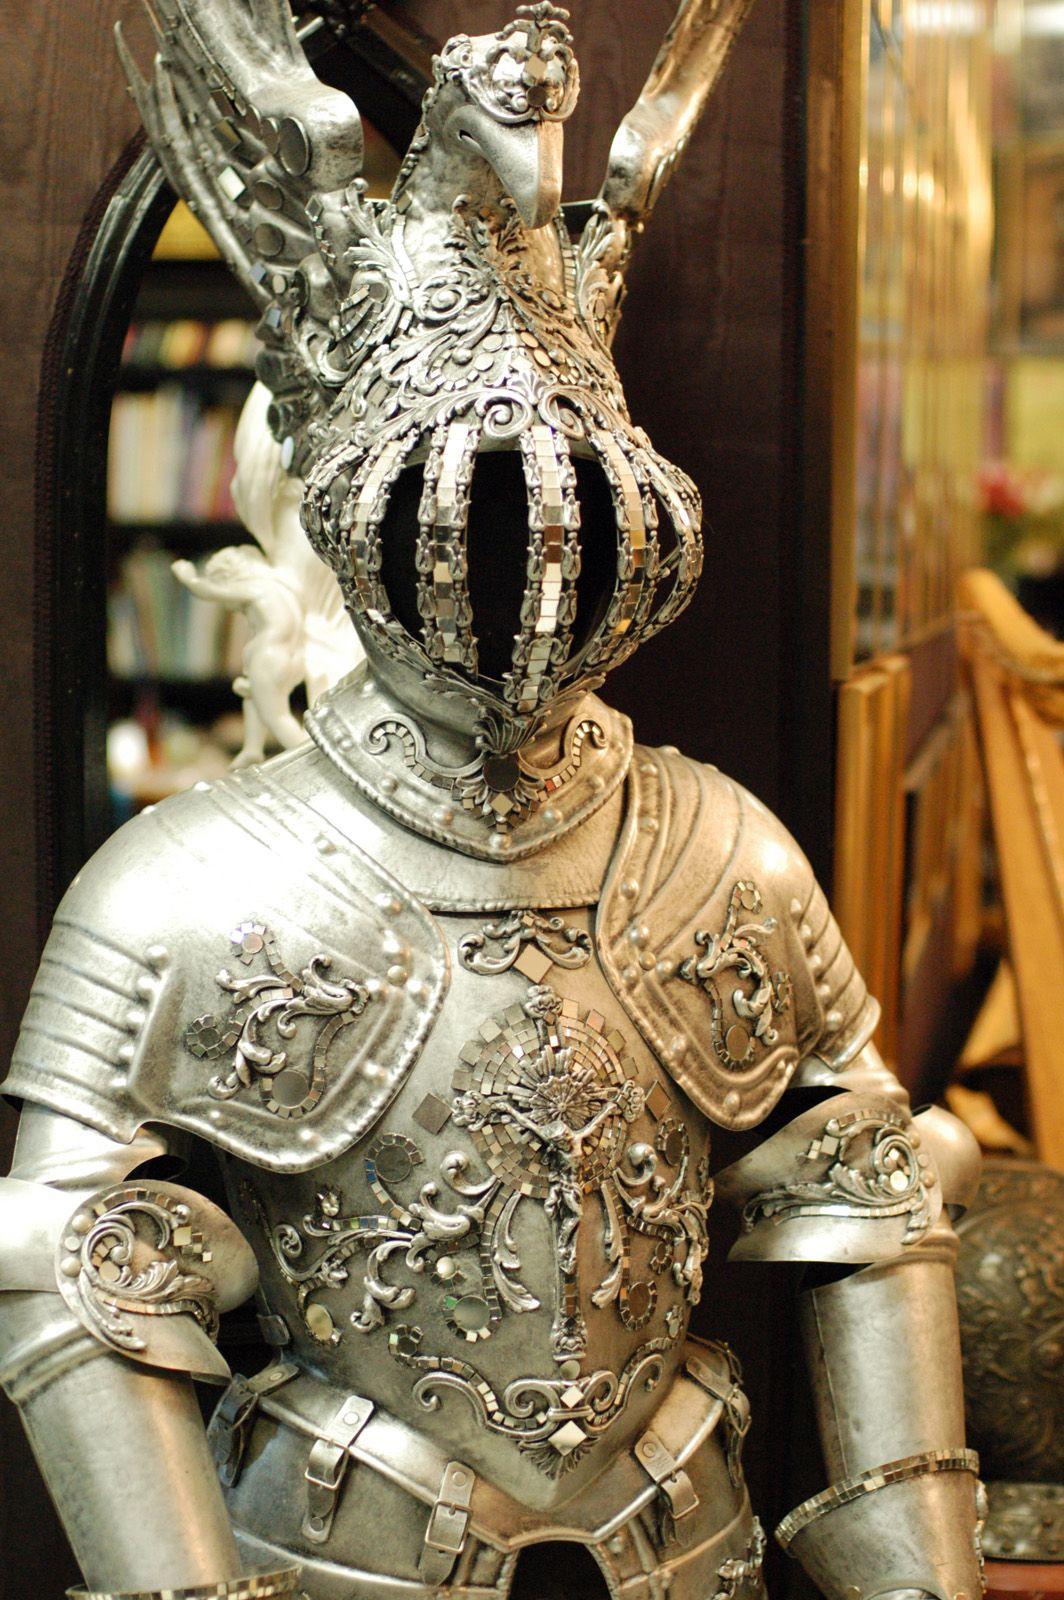 Knight Of The Mirrors Love The Helmet 중세 갑옷 패션 포스터 중세